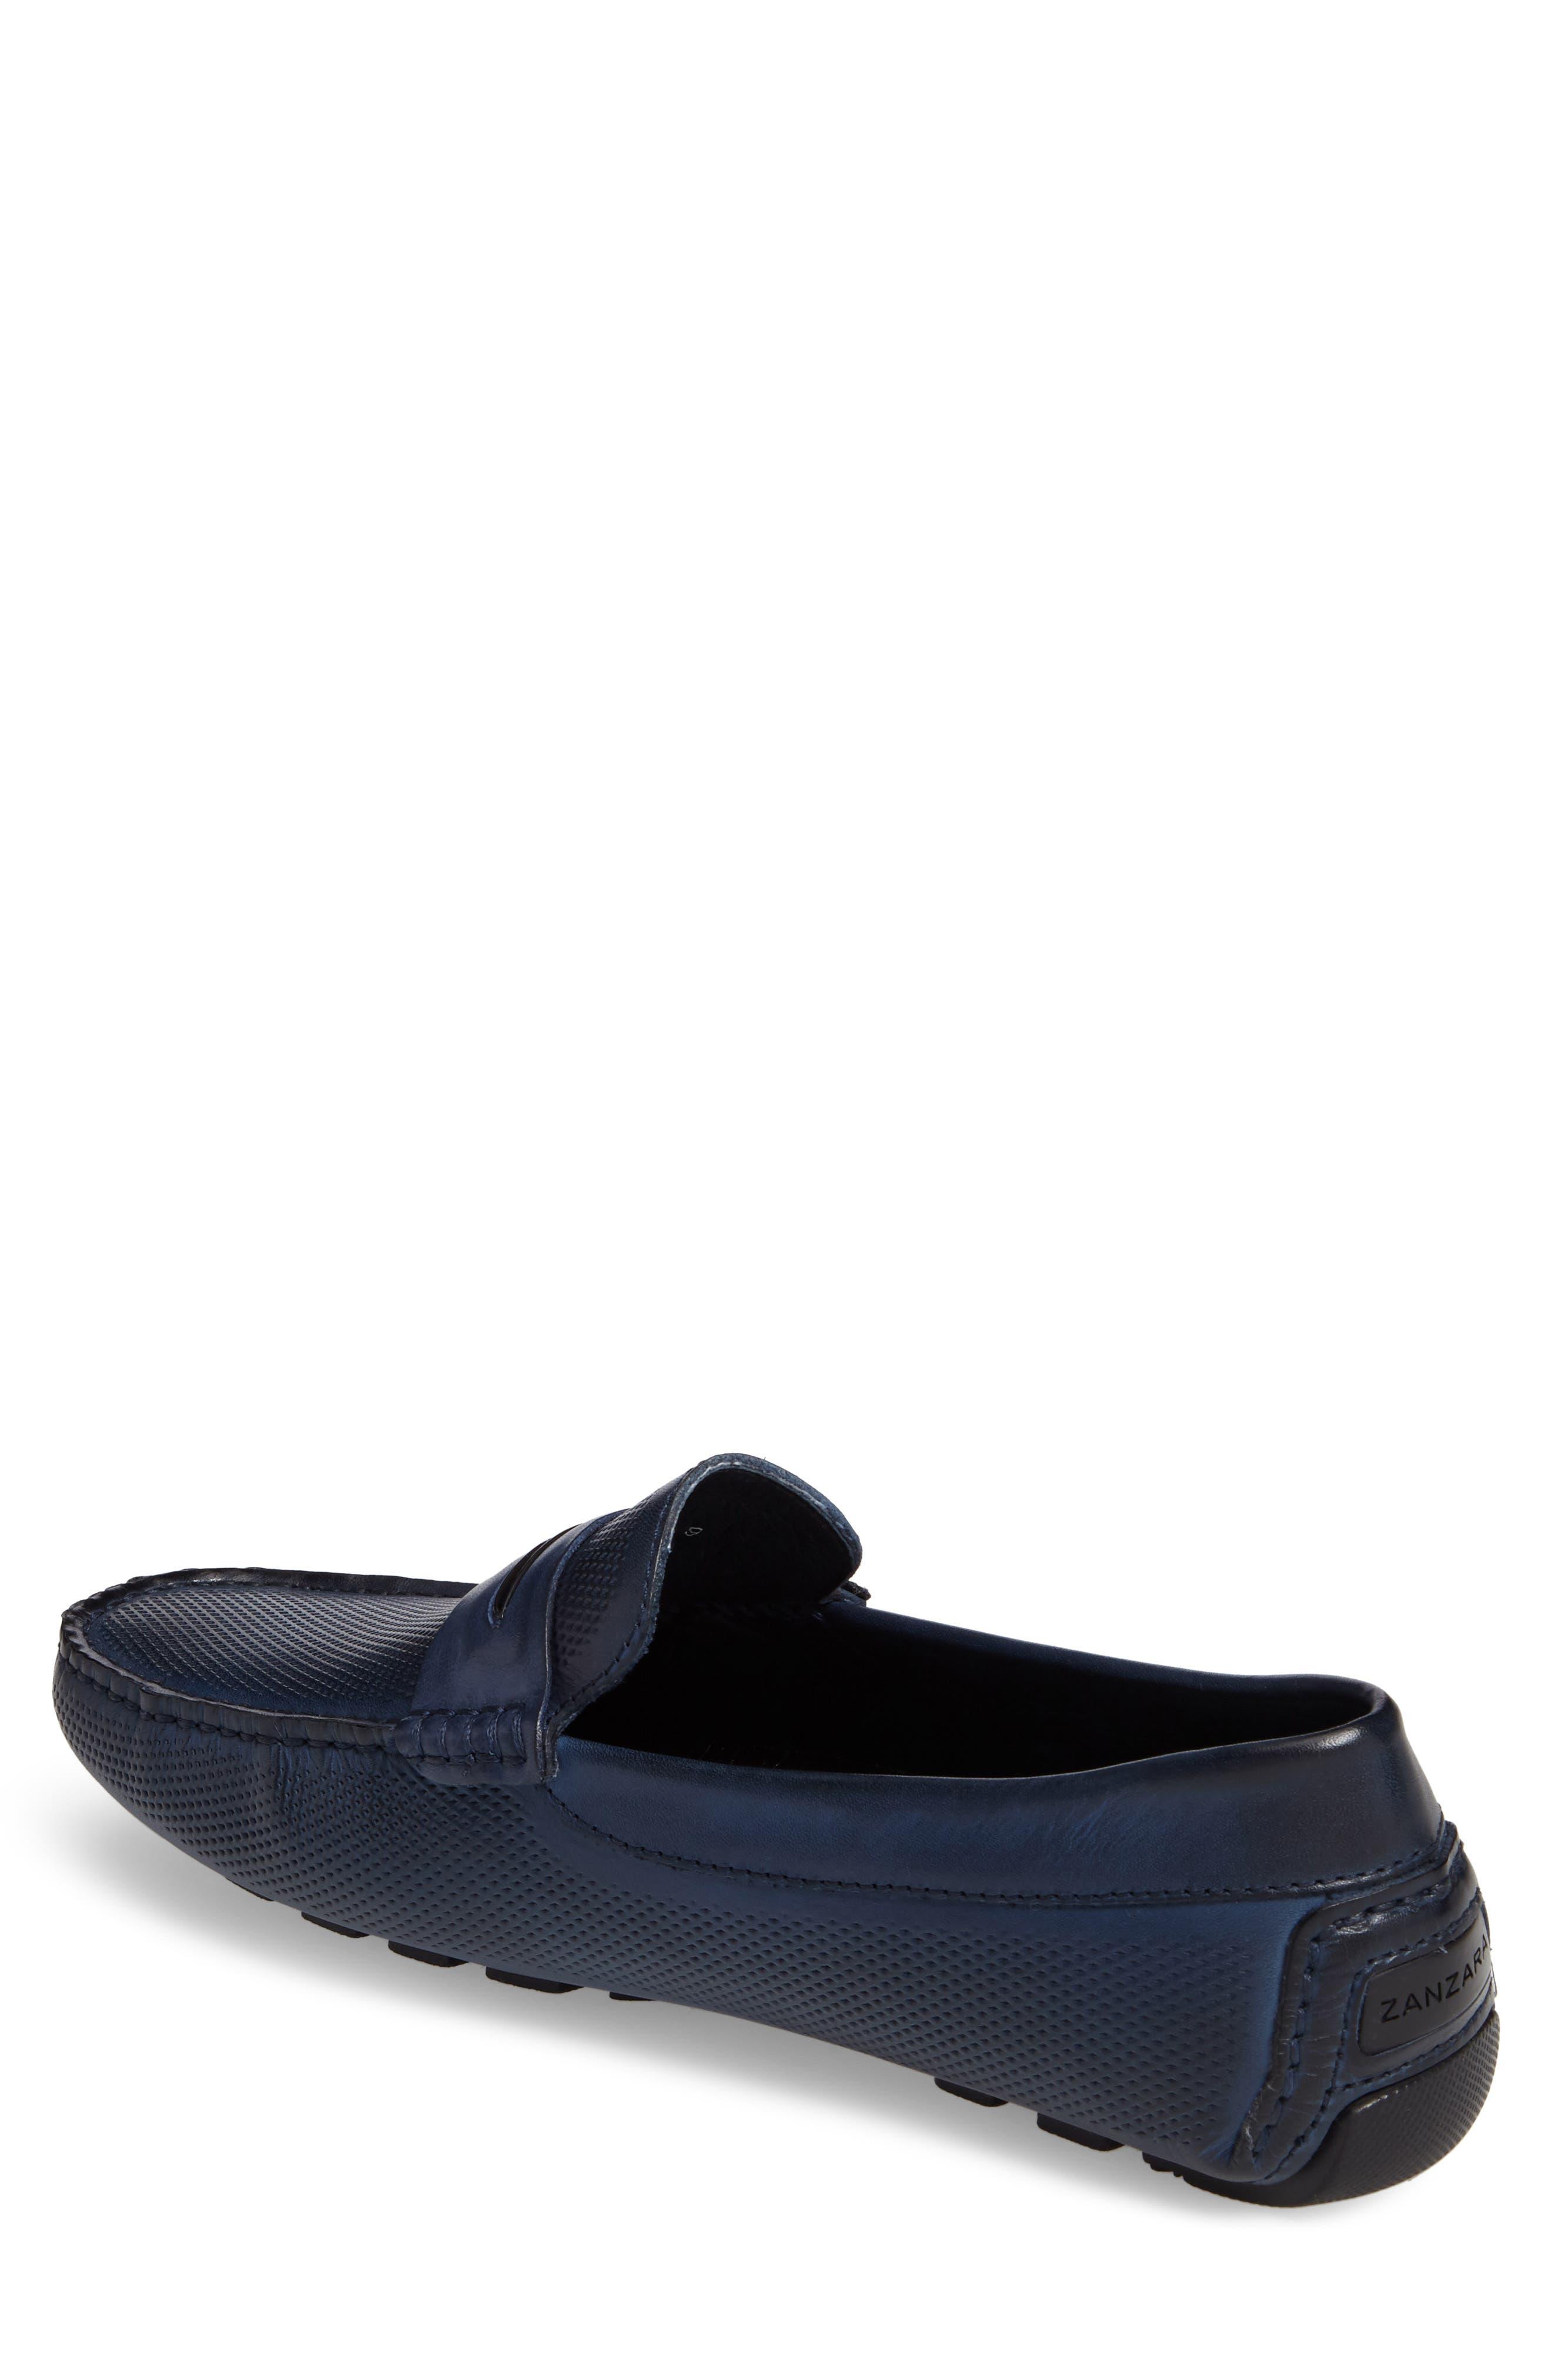 Alternate Image 2  - Zanzara Mondrian Driving Shoe (Men)